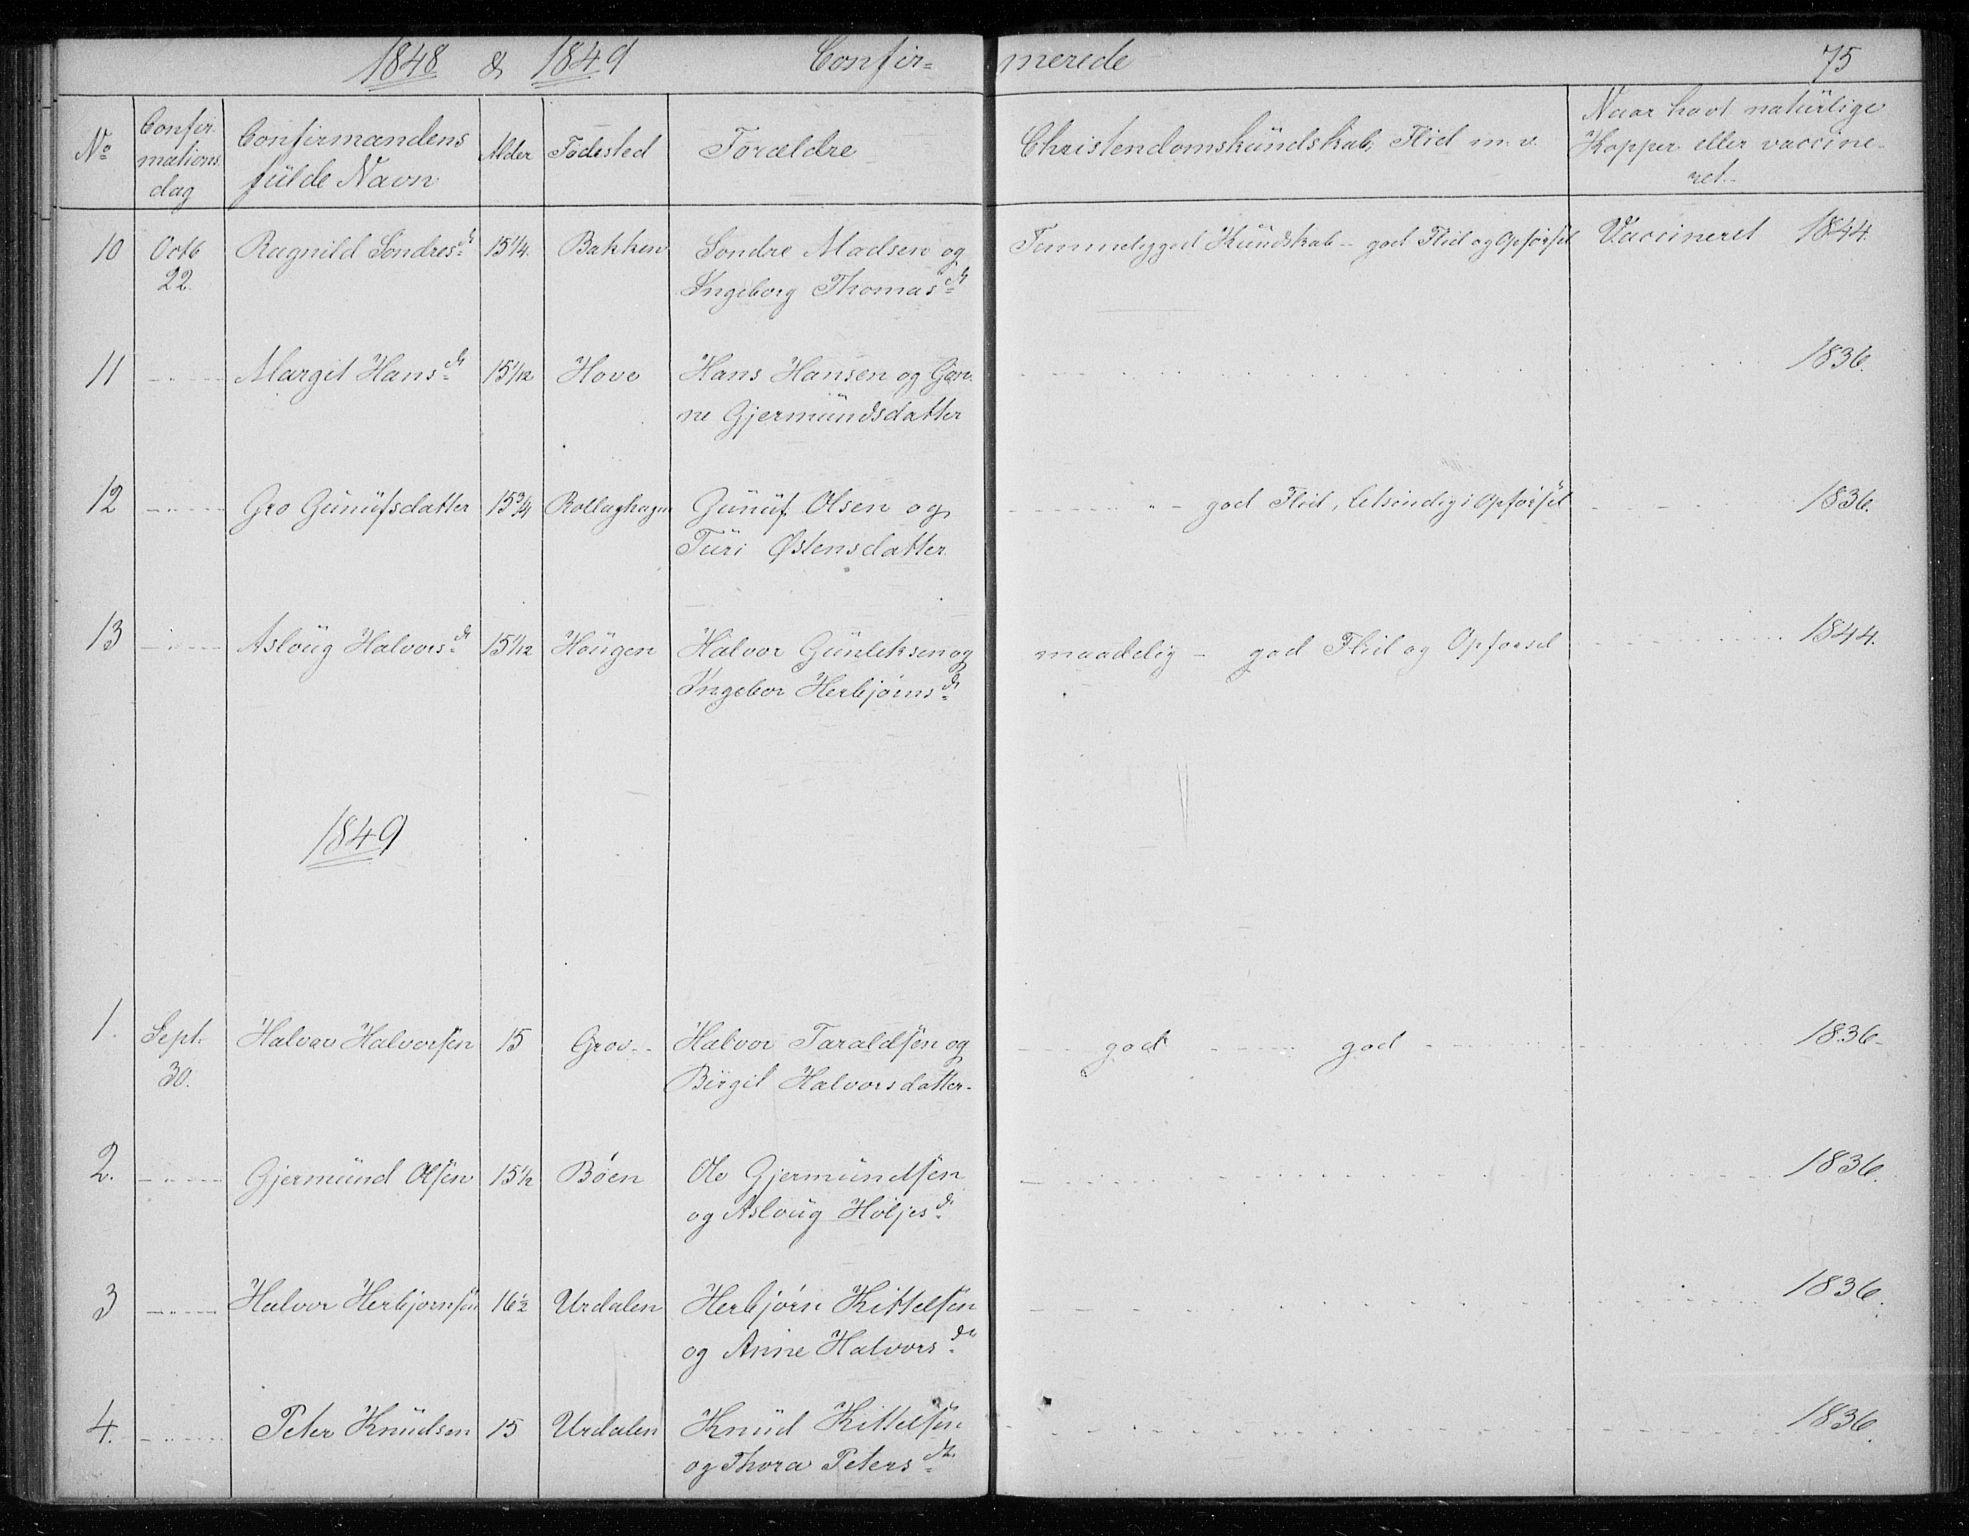 SAKO, Gransherad kirkebøker, F/Fb/L0003: Ministerialbok nr. II 3, 1844-1859, s. 75